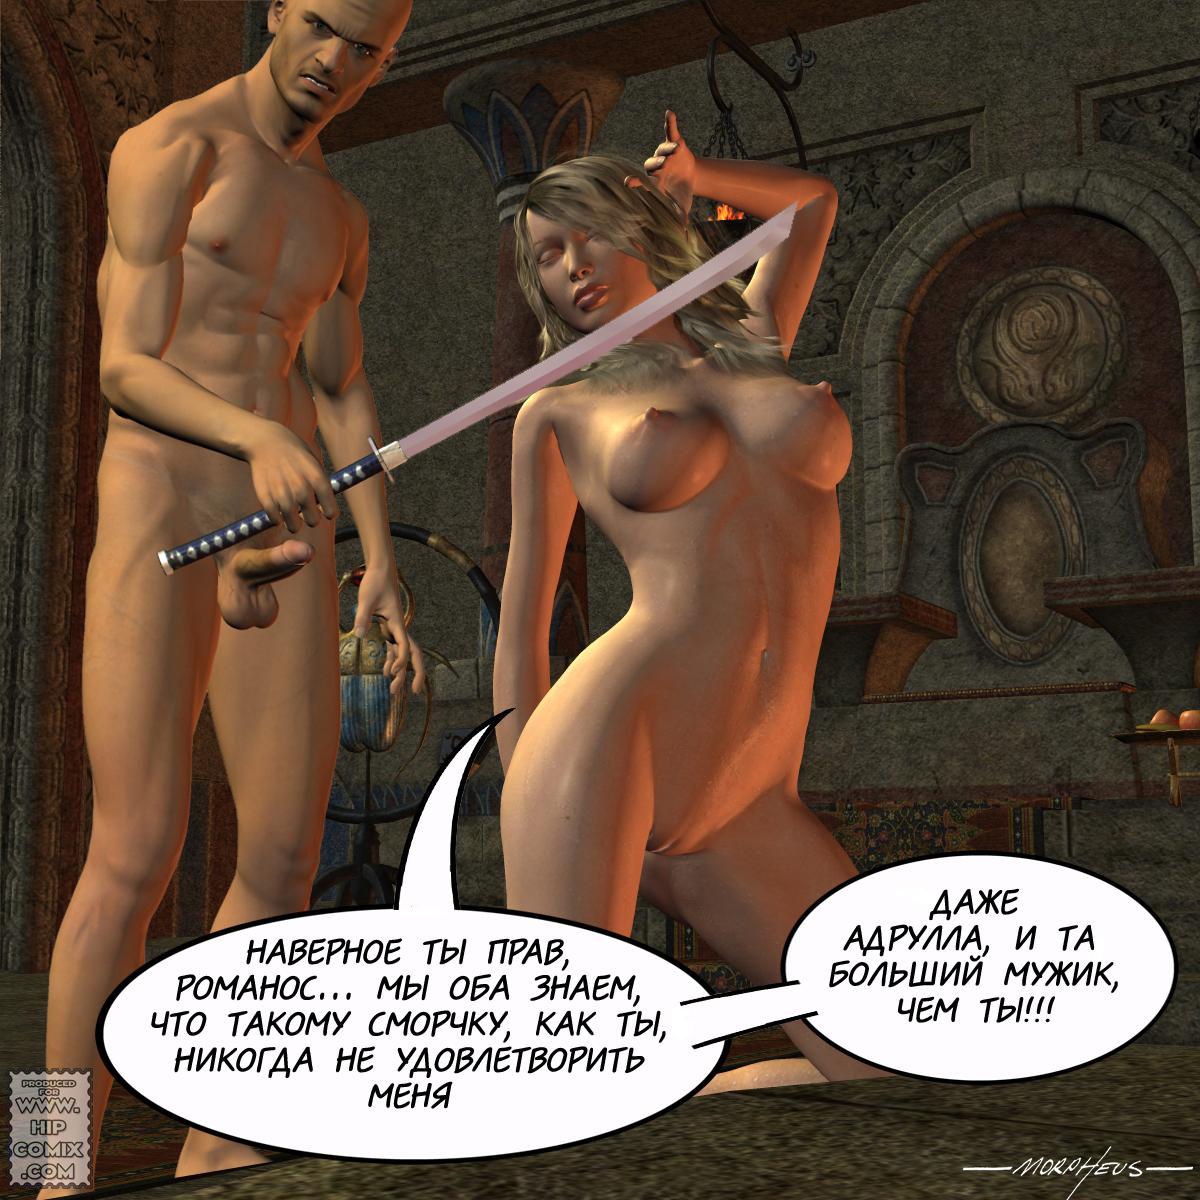 Категории   Порно комиксы рисунки арт онлайн